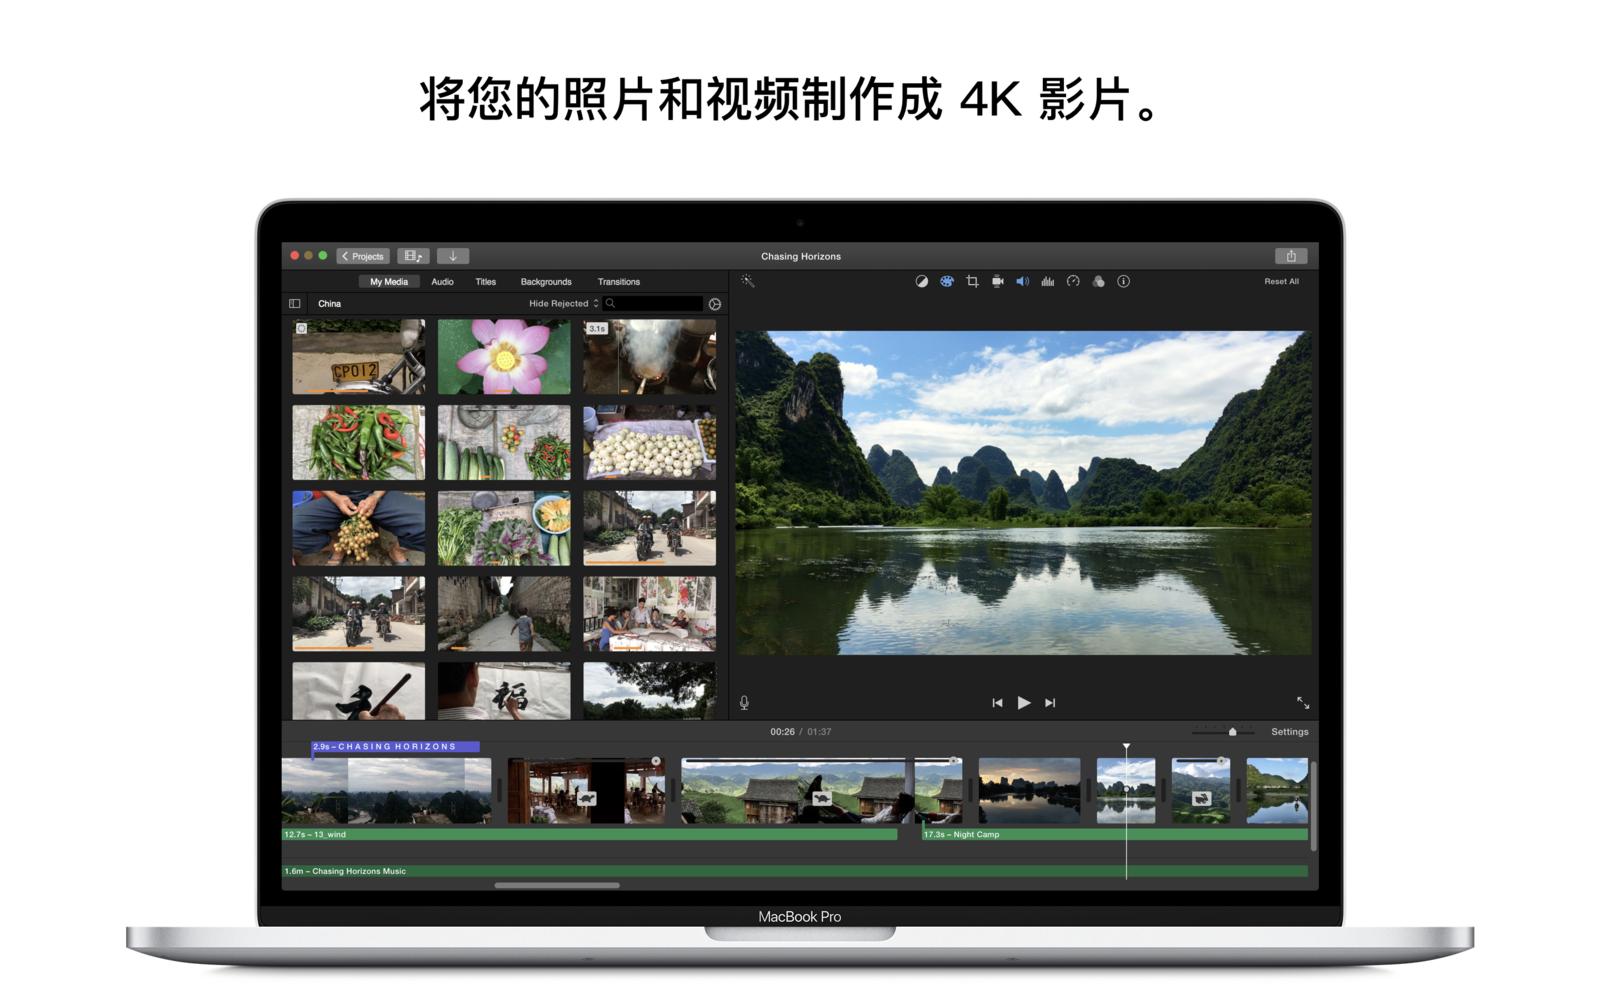 iMovie 10.1.10视频剪辑软件